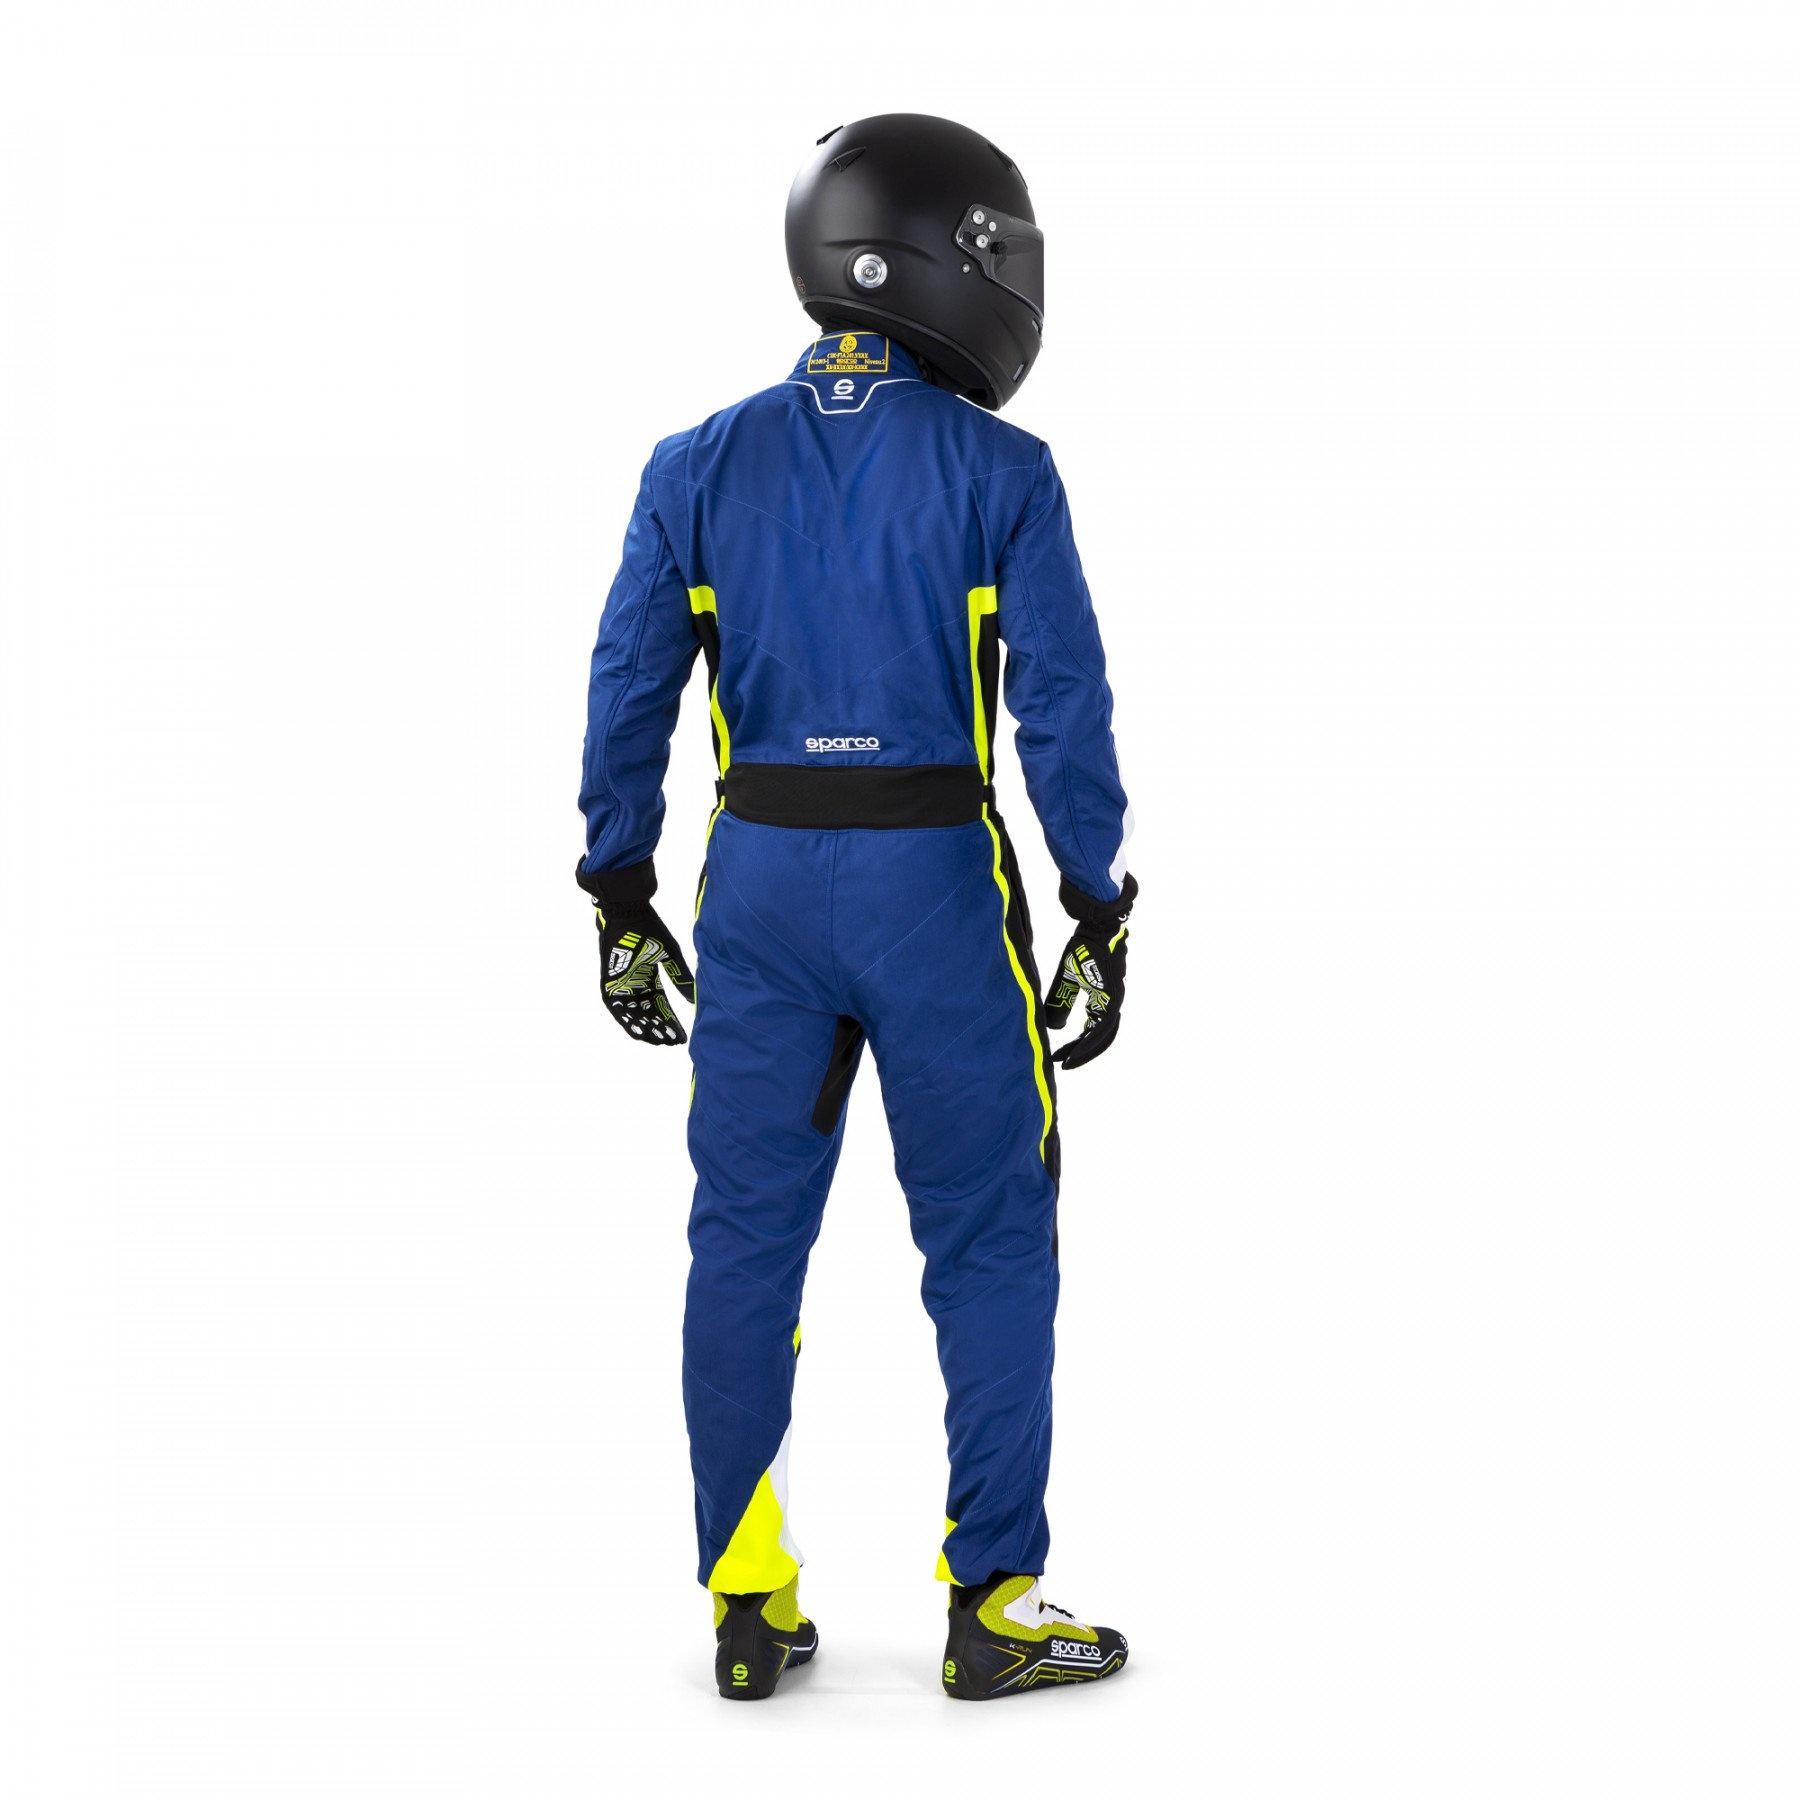 Sparco Kerb Blau Schwarz Gelb